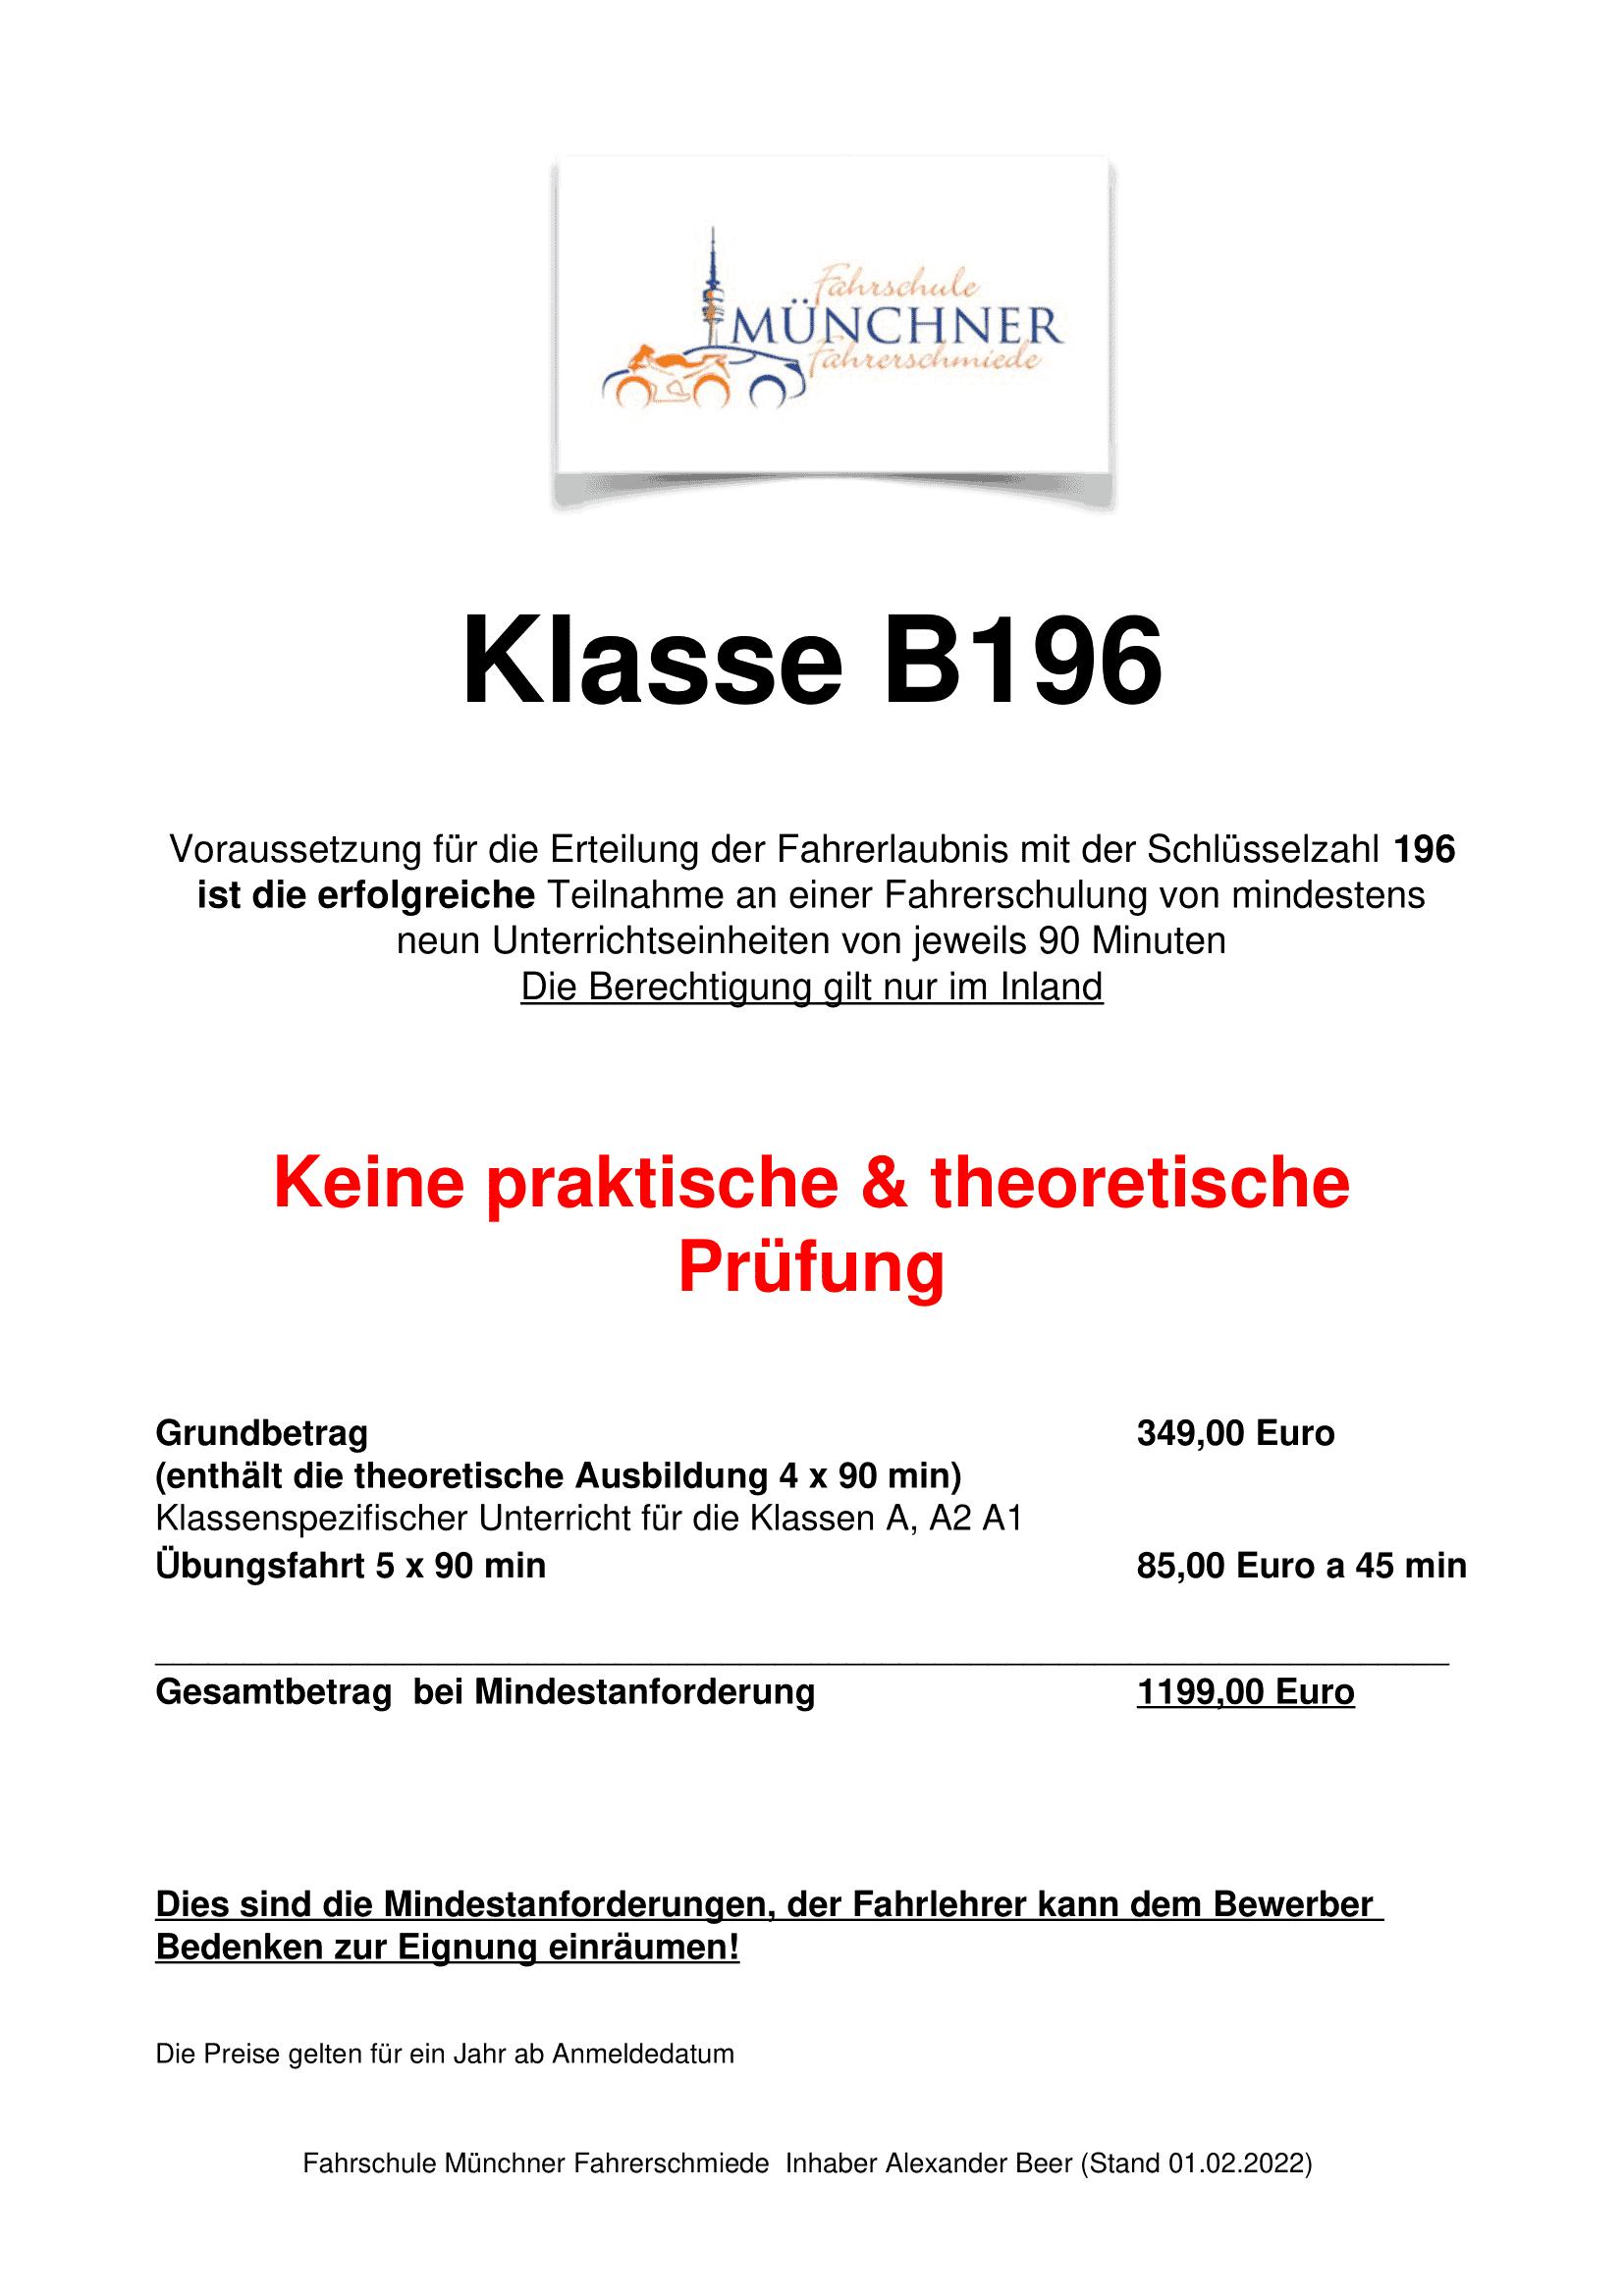 B-196 Preise